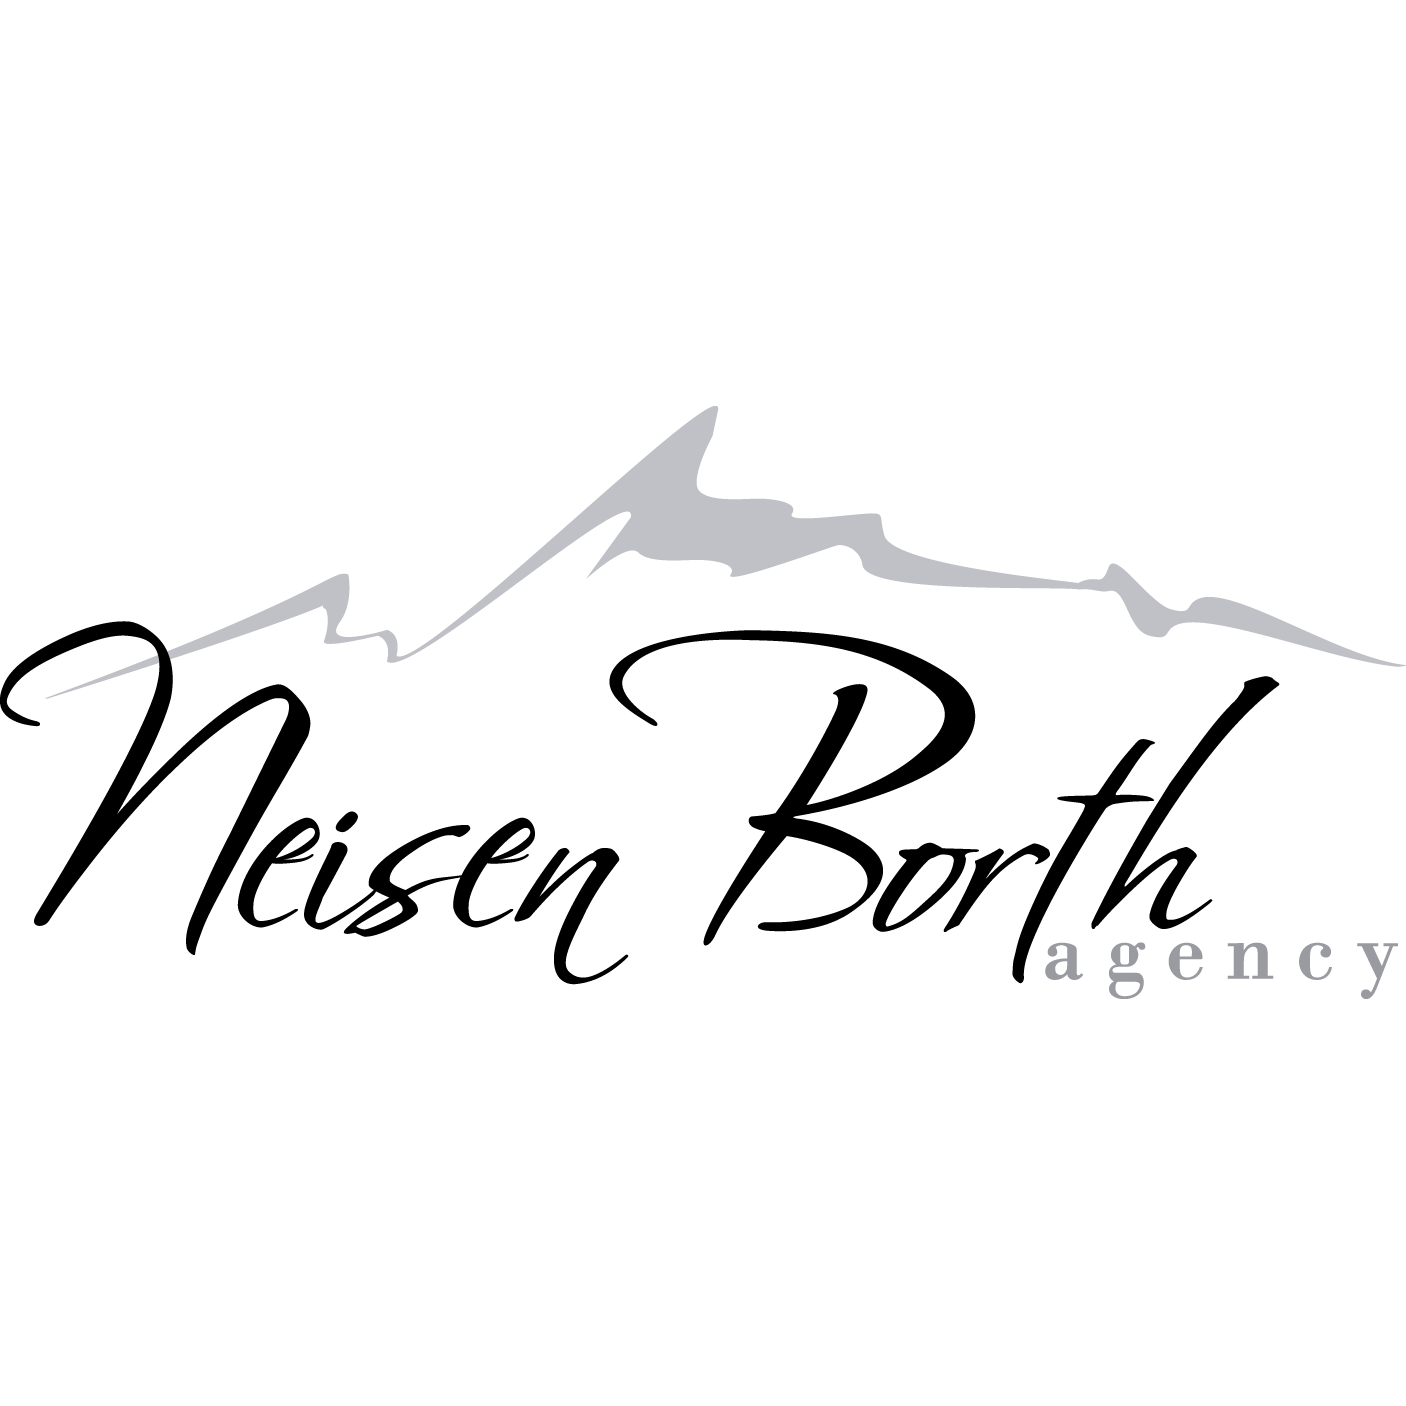 Neisen Borth Insurance